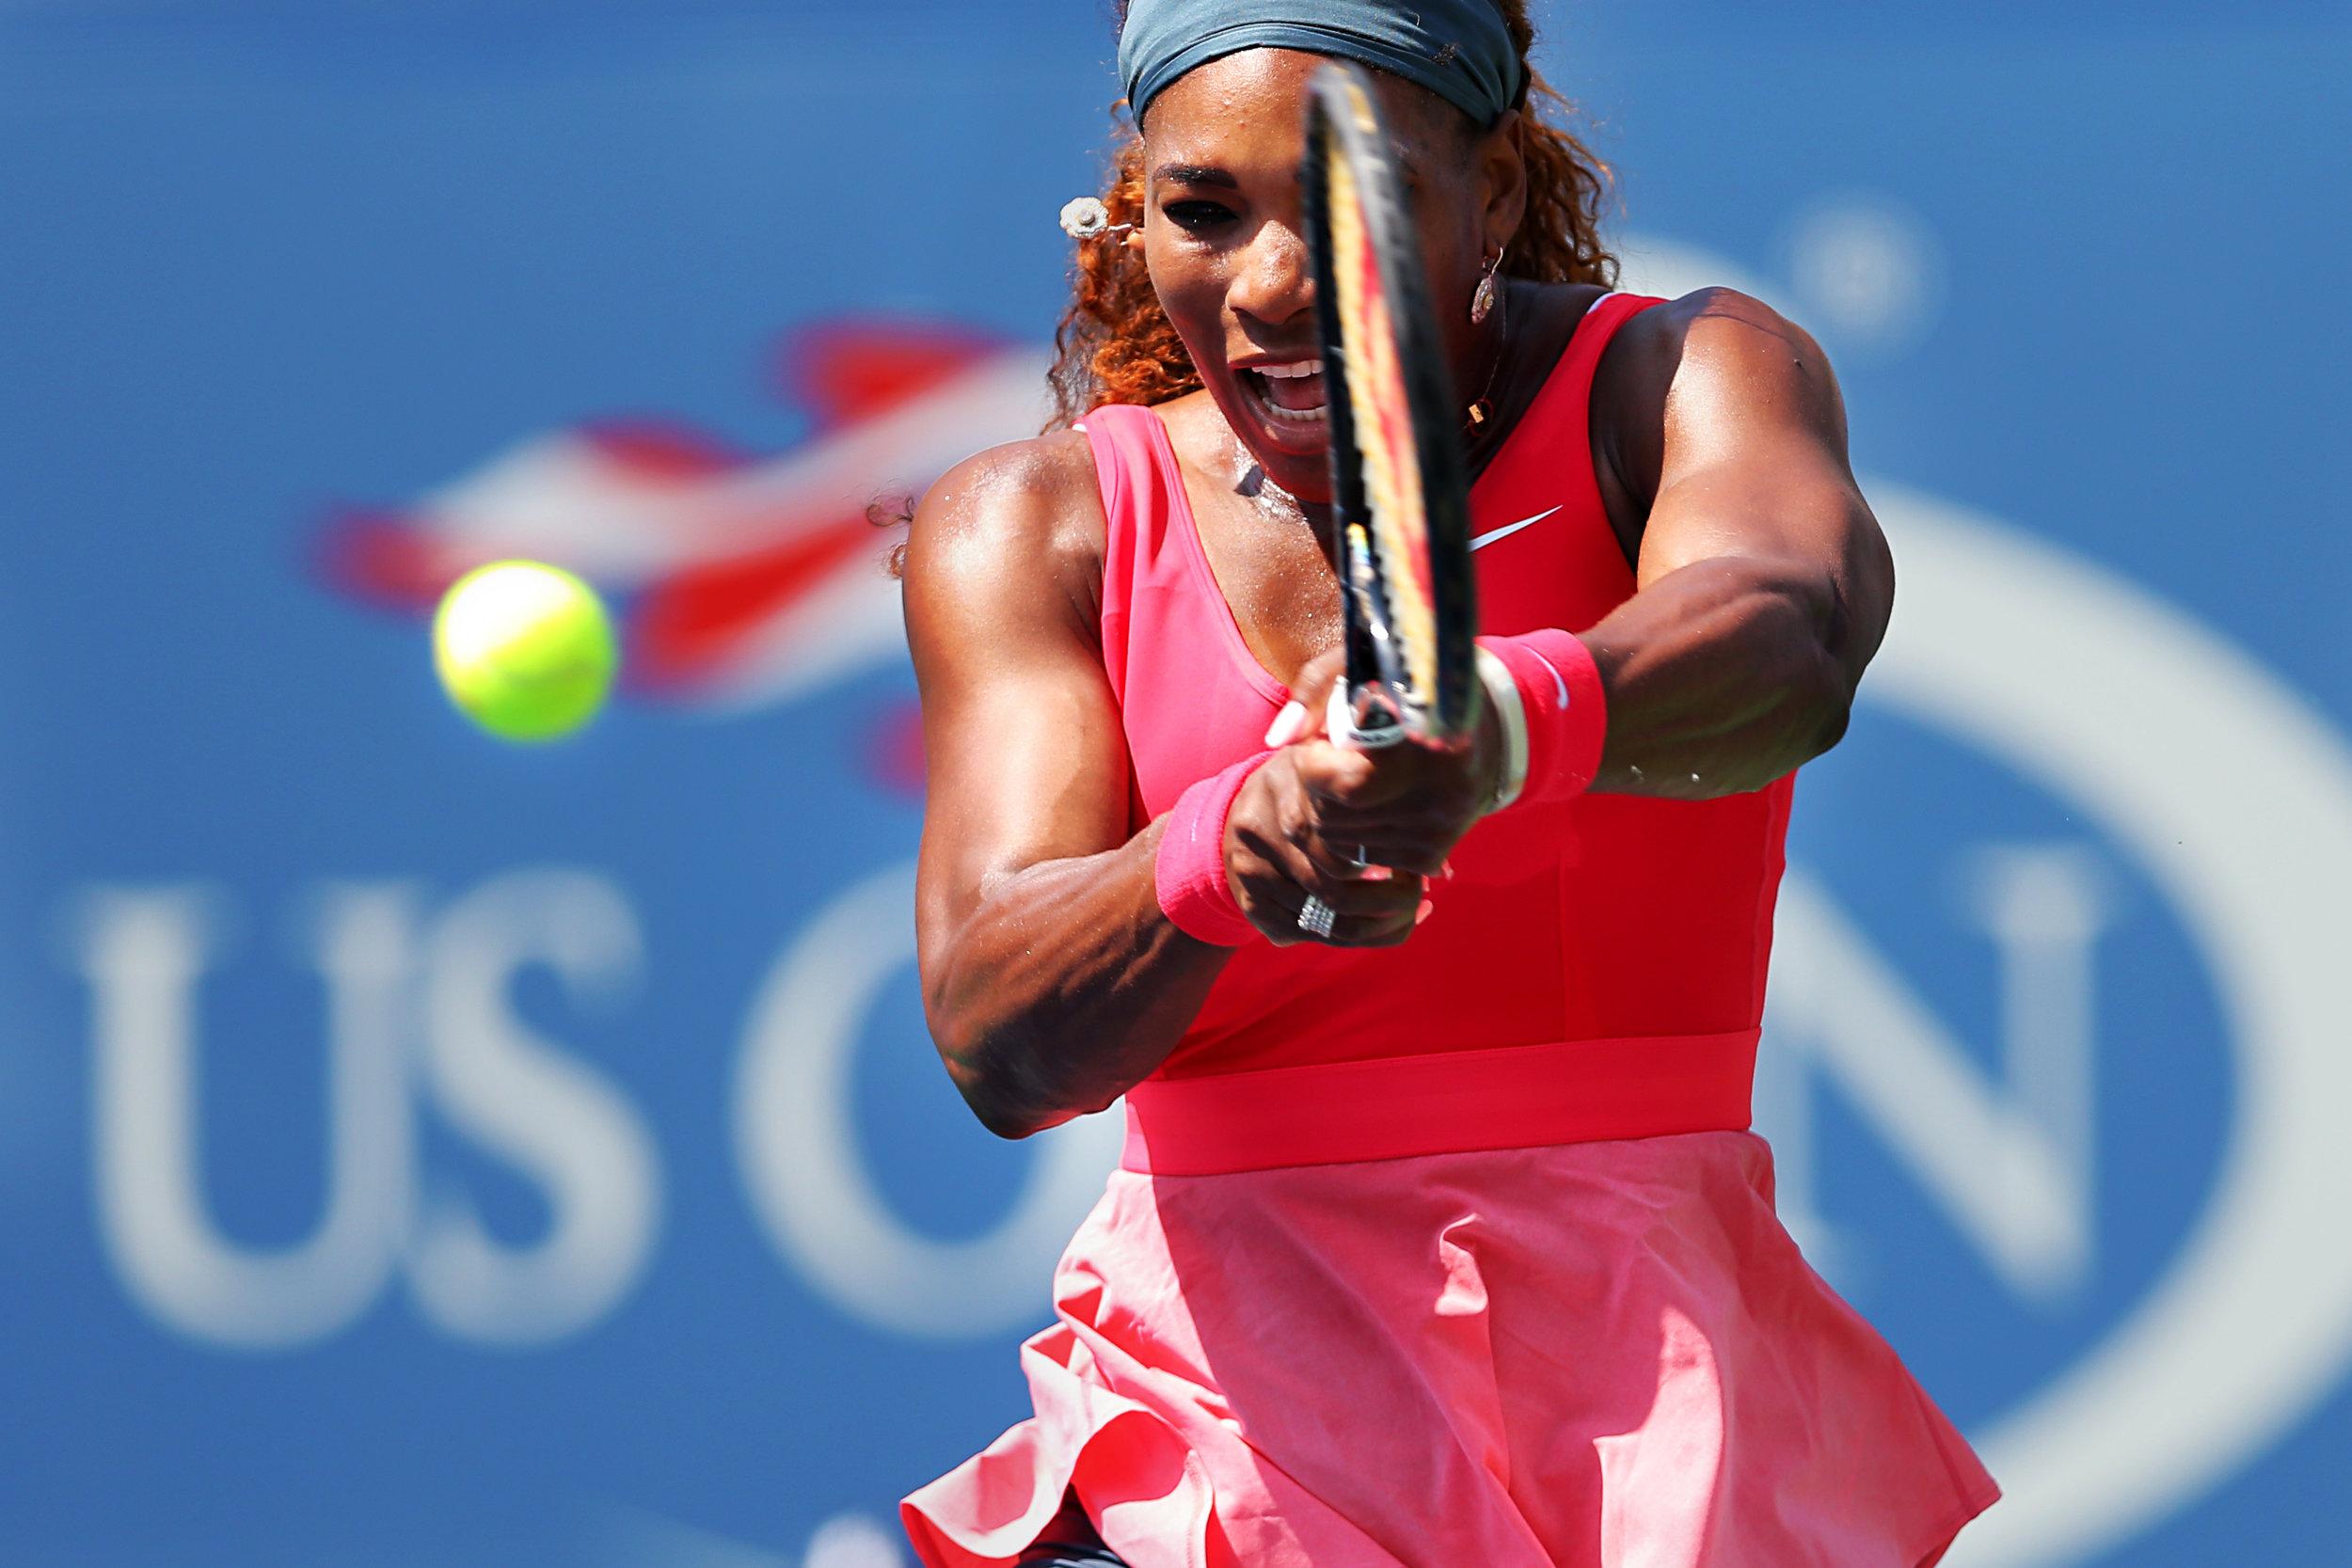 Serena Williams returns to Galina Voskoboeva during the women singles second round at the U.S. Open tennis tournament held at Arthur Ashe Stadium in Queens, Ny. Williams defeated Voskoboeva 6-3, 6-0.